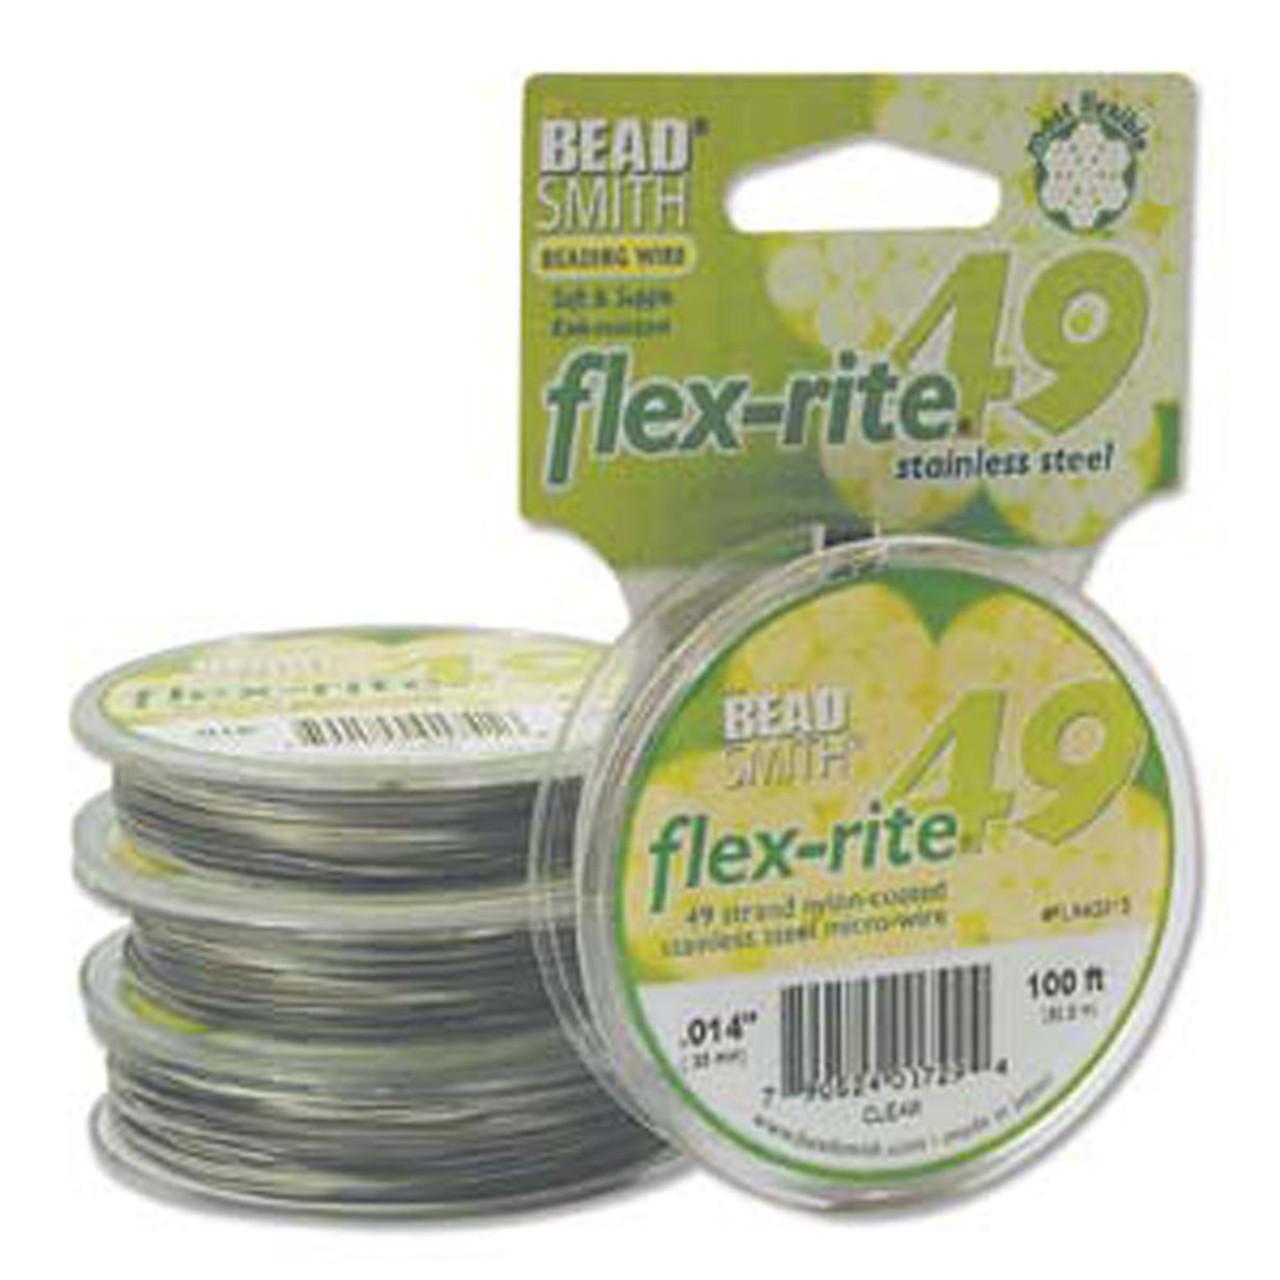 100 ft  Flex-Rite 7 Strand Bead Smith Beading Wire  Fine Medium Heavy